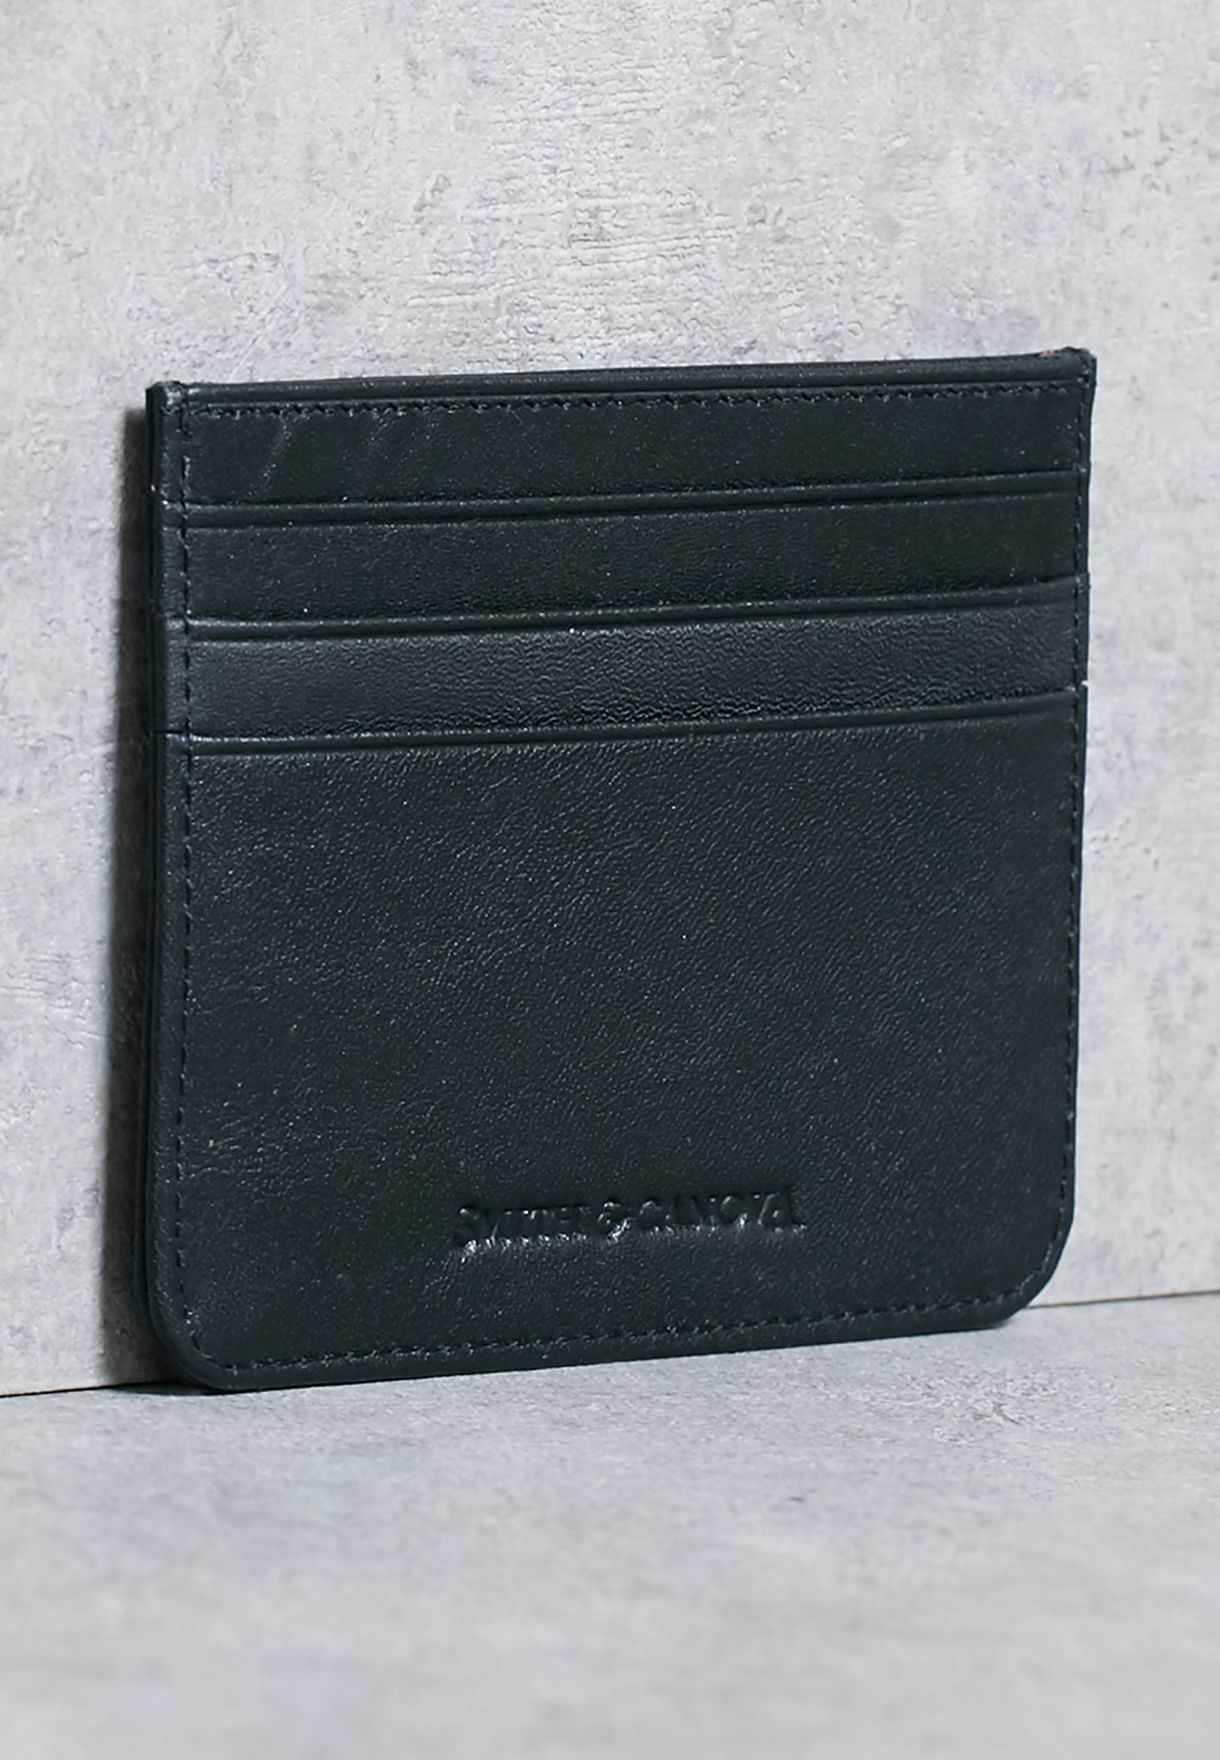 57396efd7fdd Shop smith   canova black Casual Credit Card Holder 28588 BLACK for ...